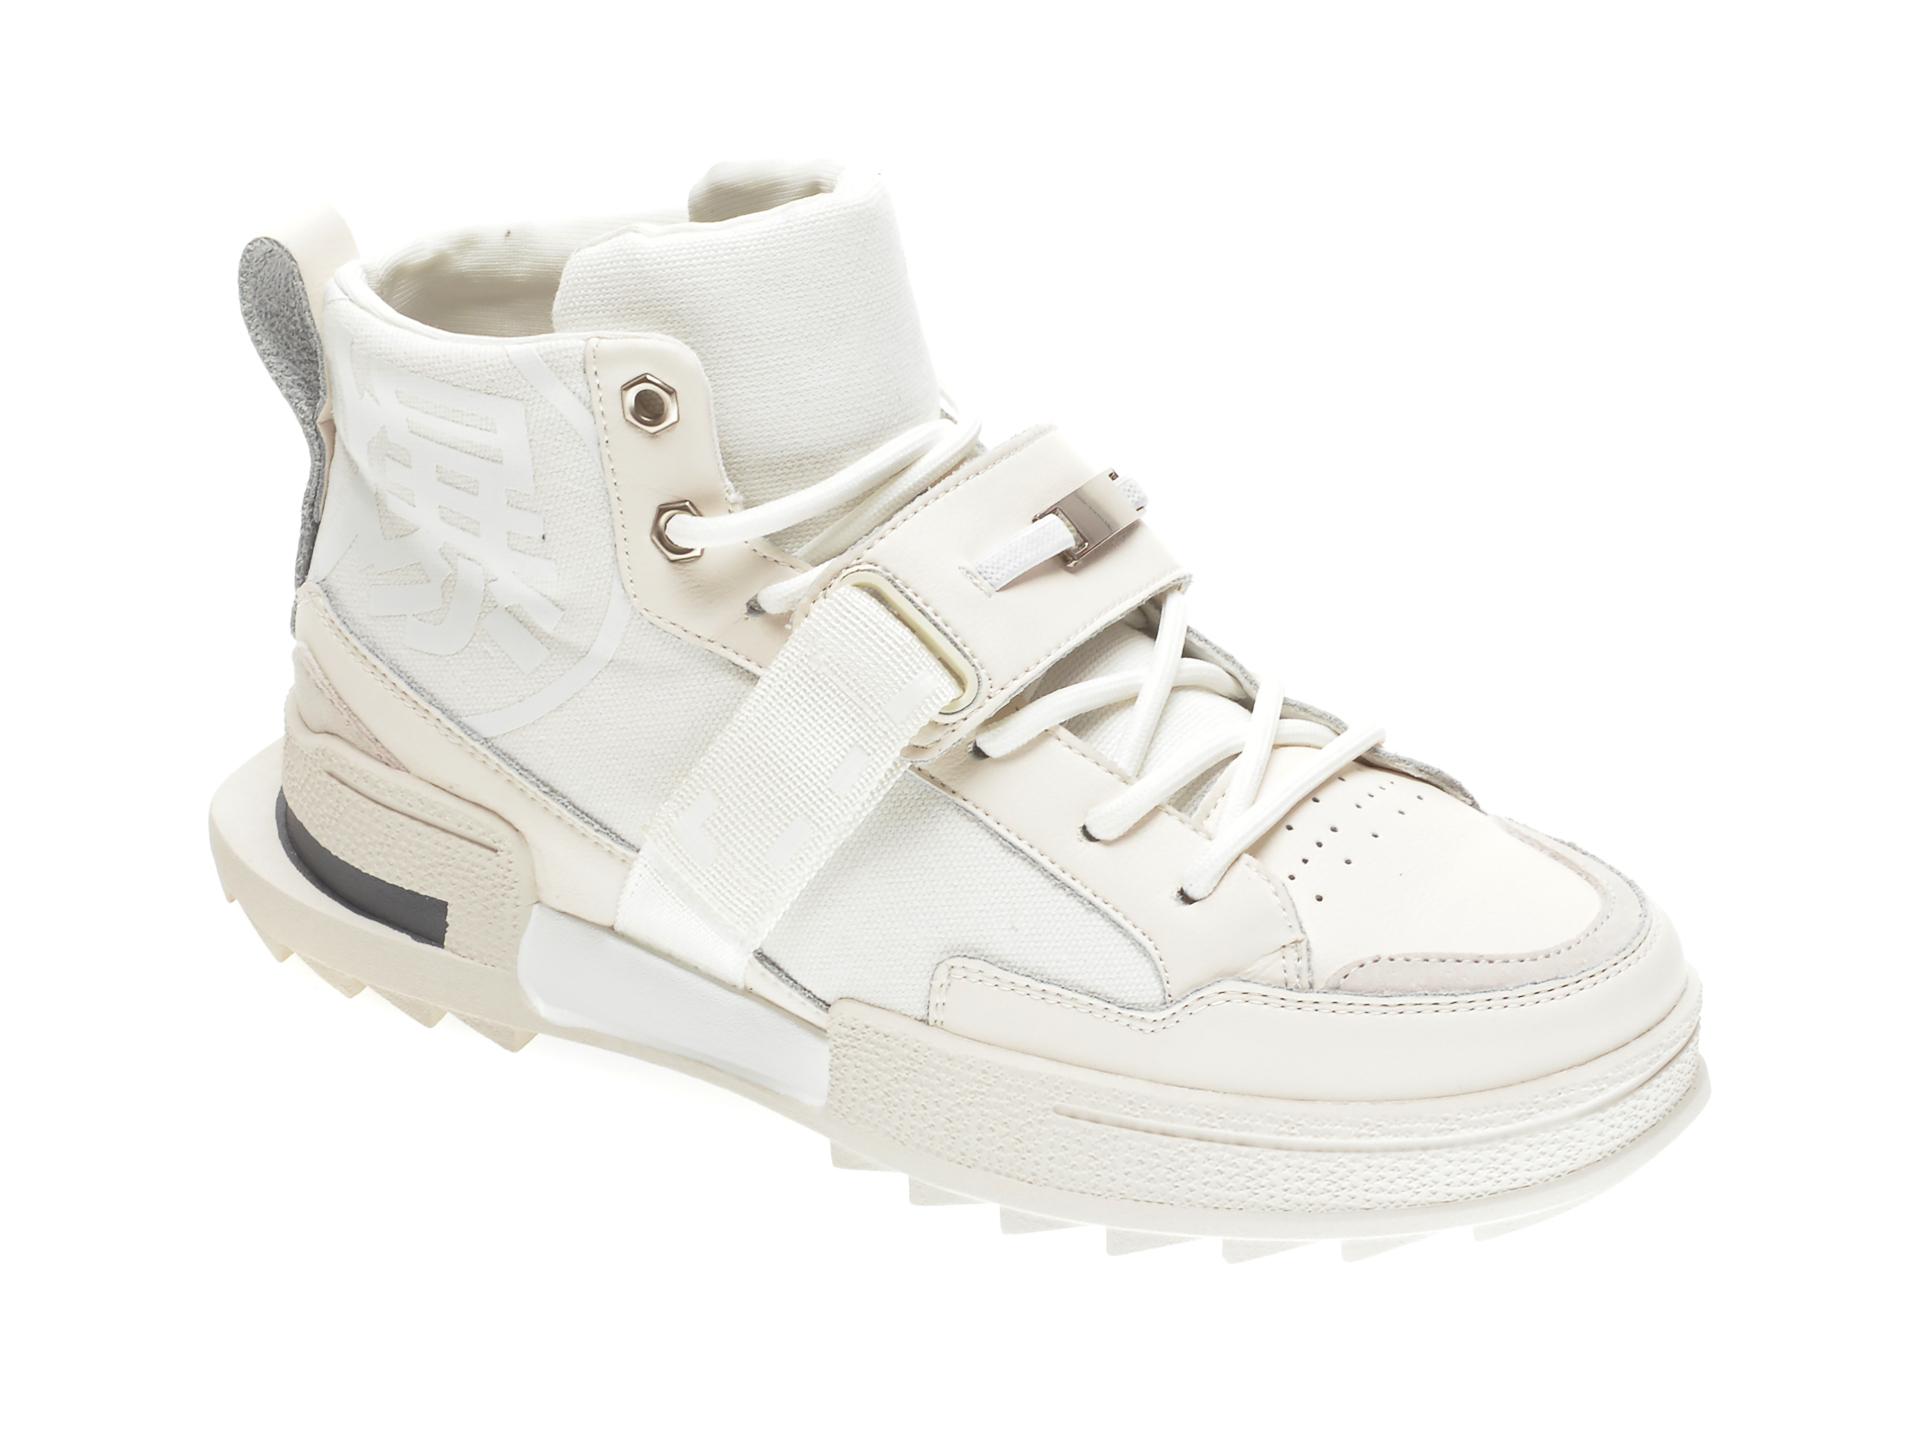 Ghete GRYXX albe, 3531, din material textil si piele naturala